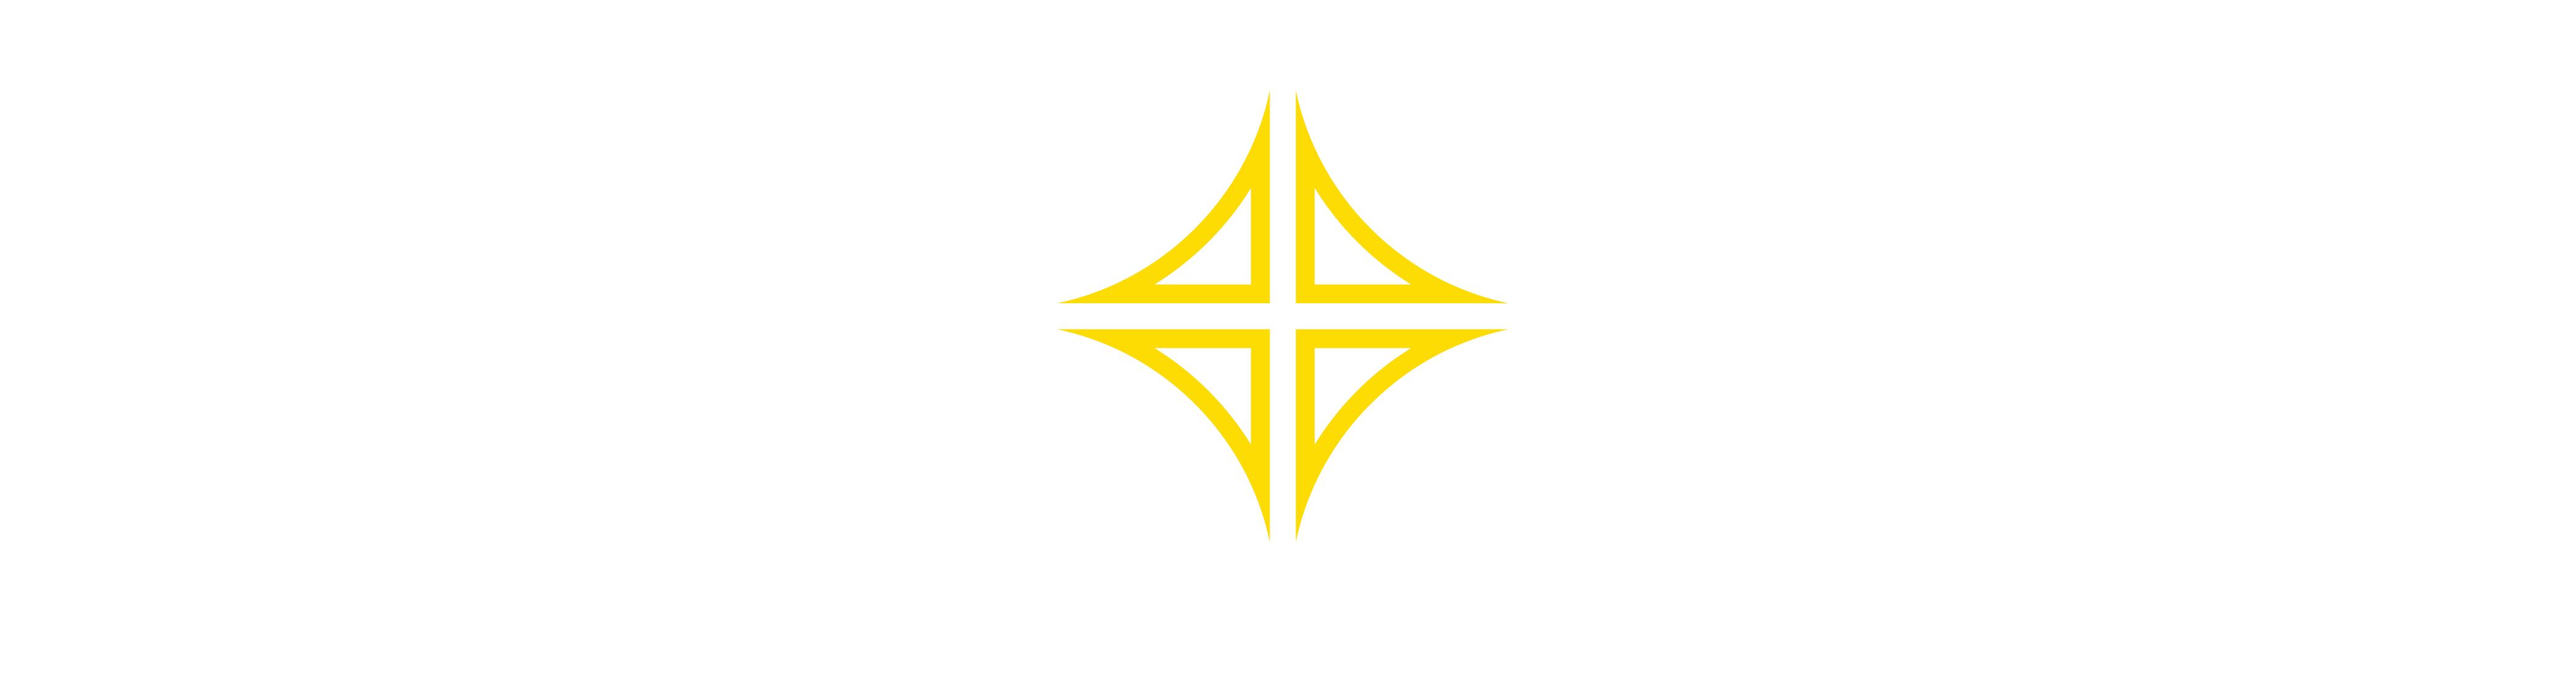 PS_logo_on_dark_bg